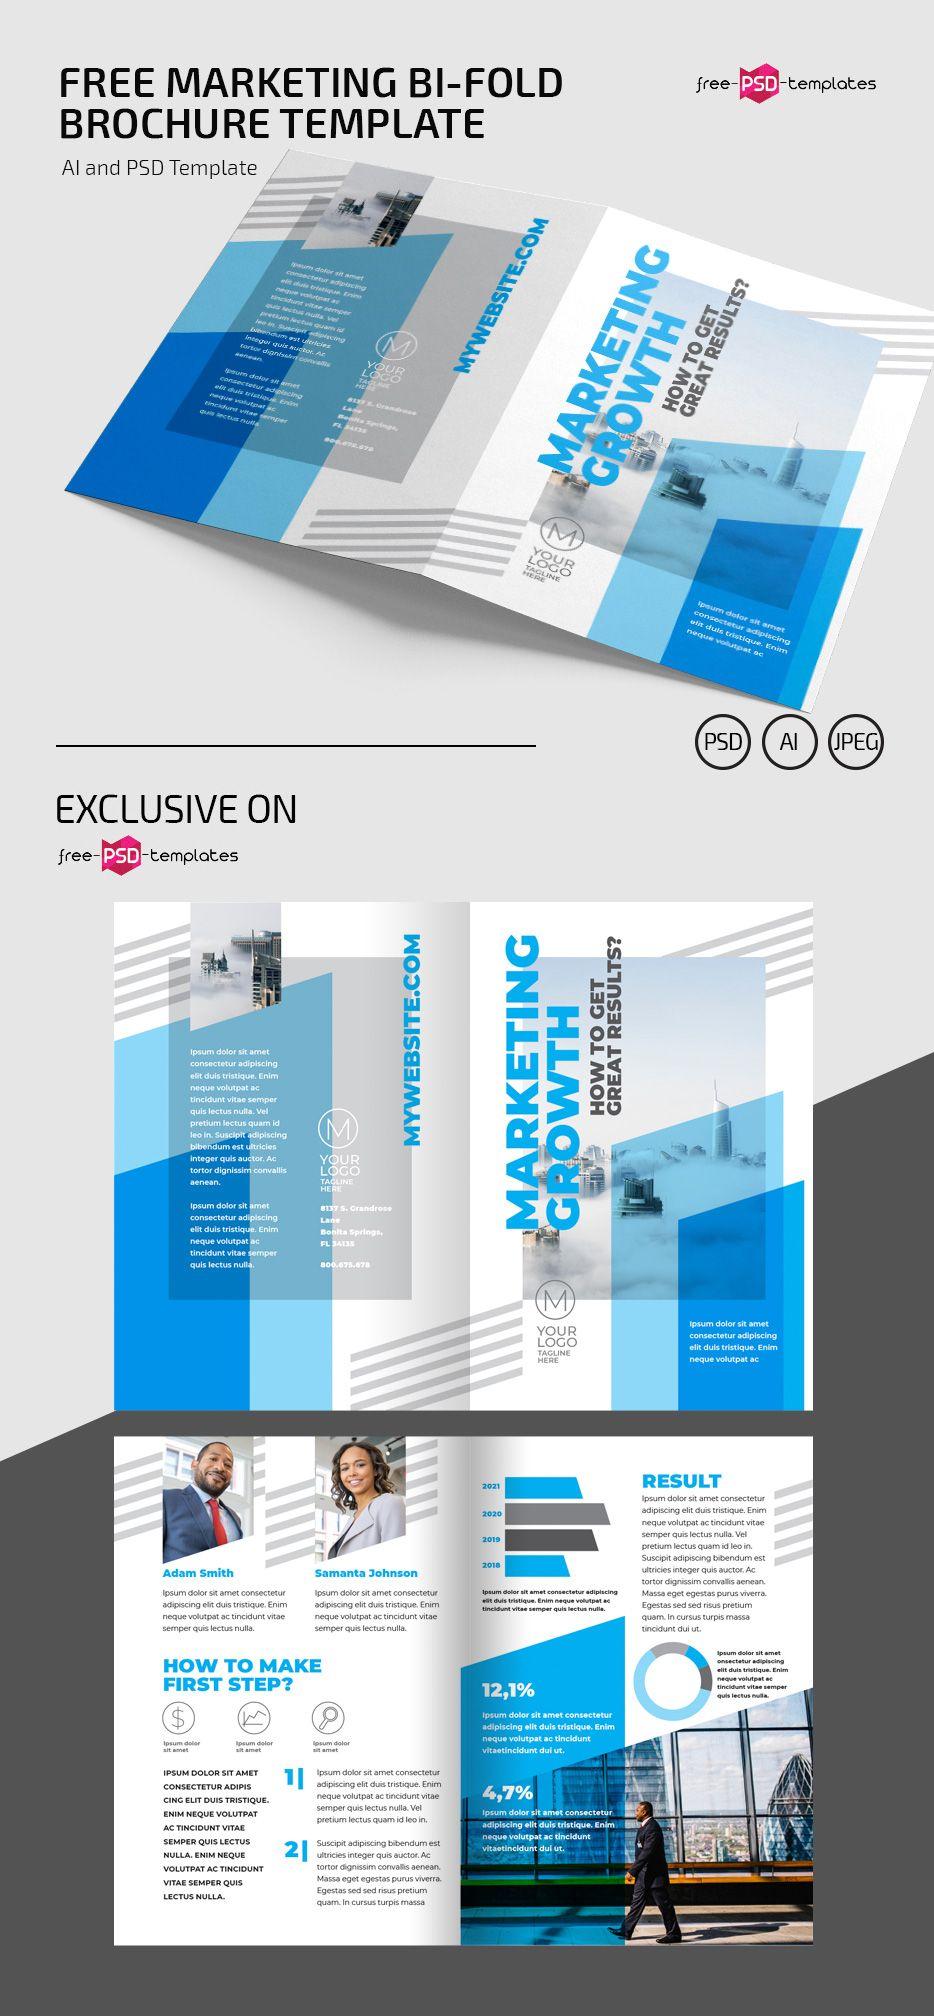 Free Marketing Bi Fold Brochure Template Bi Fold Brochure Brochure Template Brochure